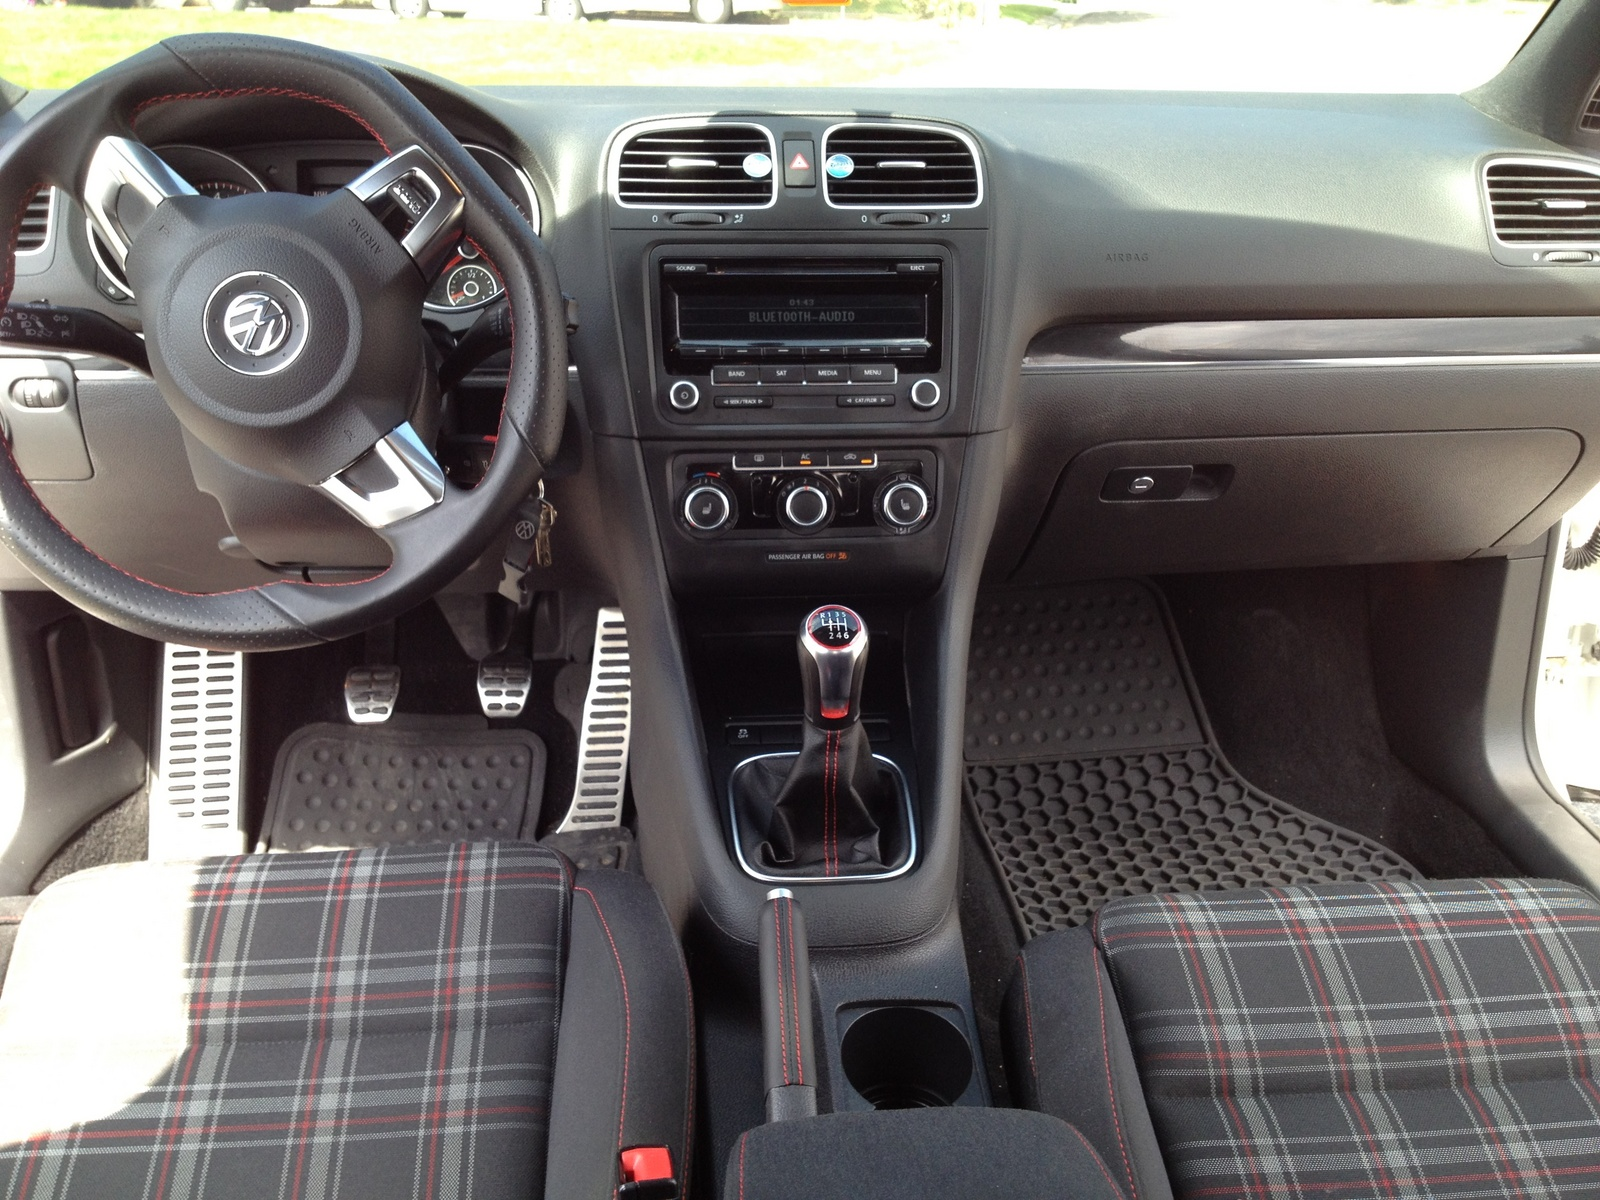 2012 Volkswagen Gti Interior Pictures Cargurus